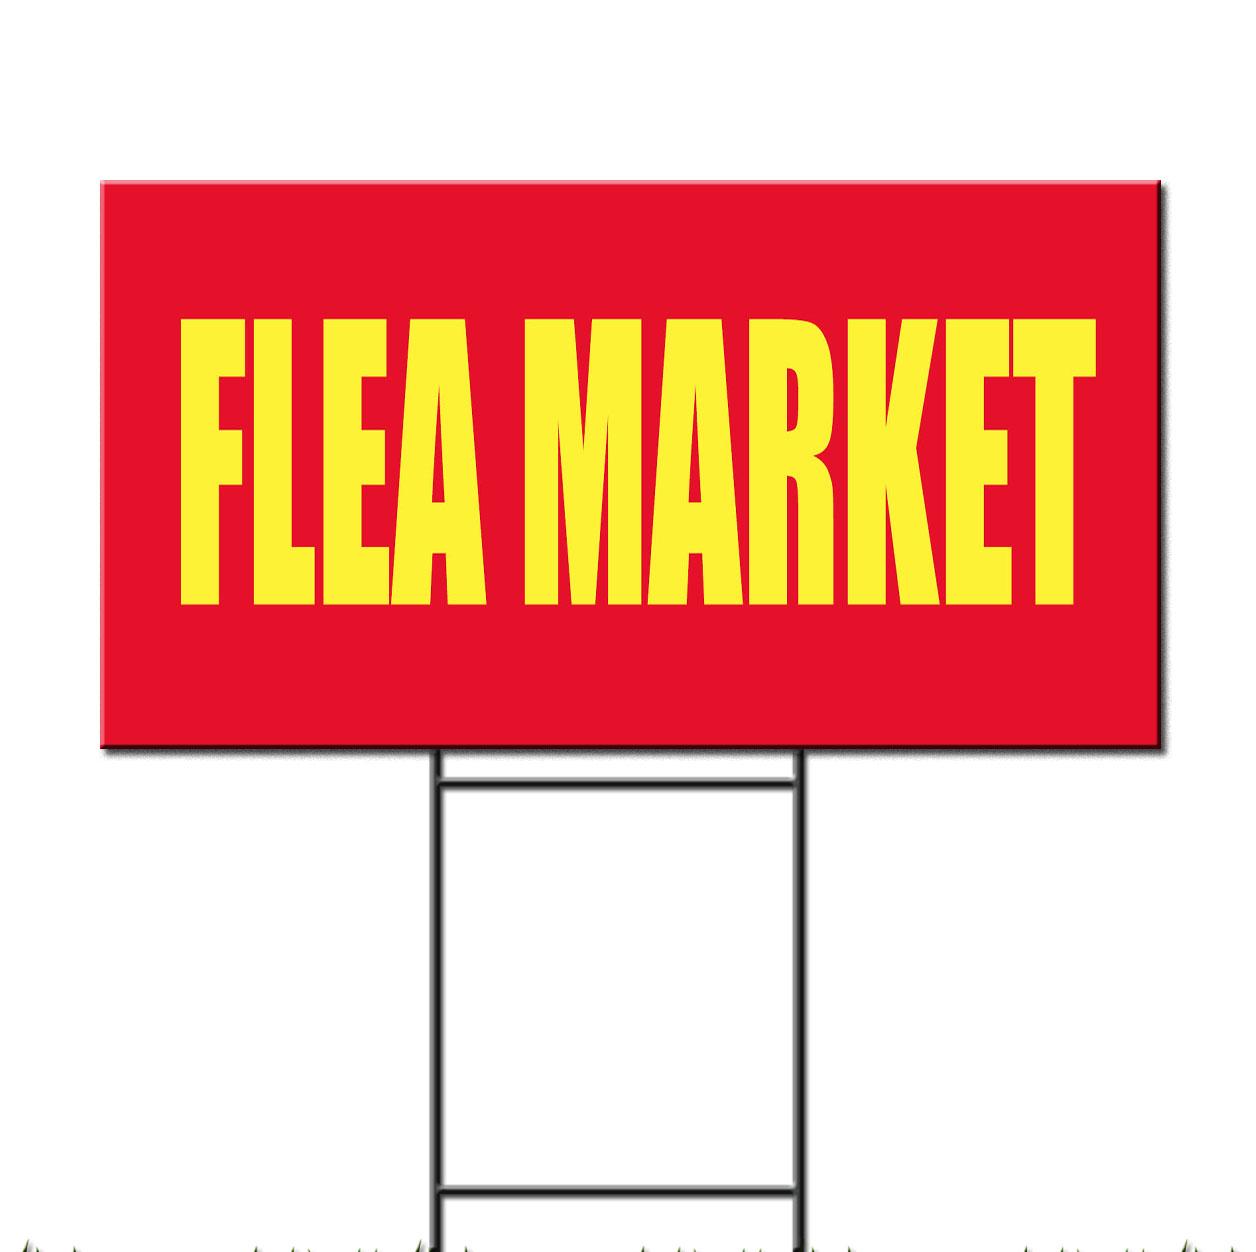 flea market promotion business corrugated plastic yard sign free stakes ebay. Black Bedroom Furniture Sets. Home Design Ideas